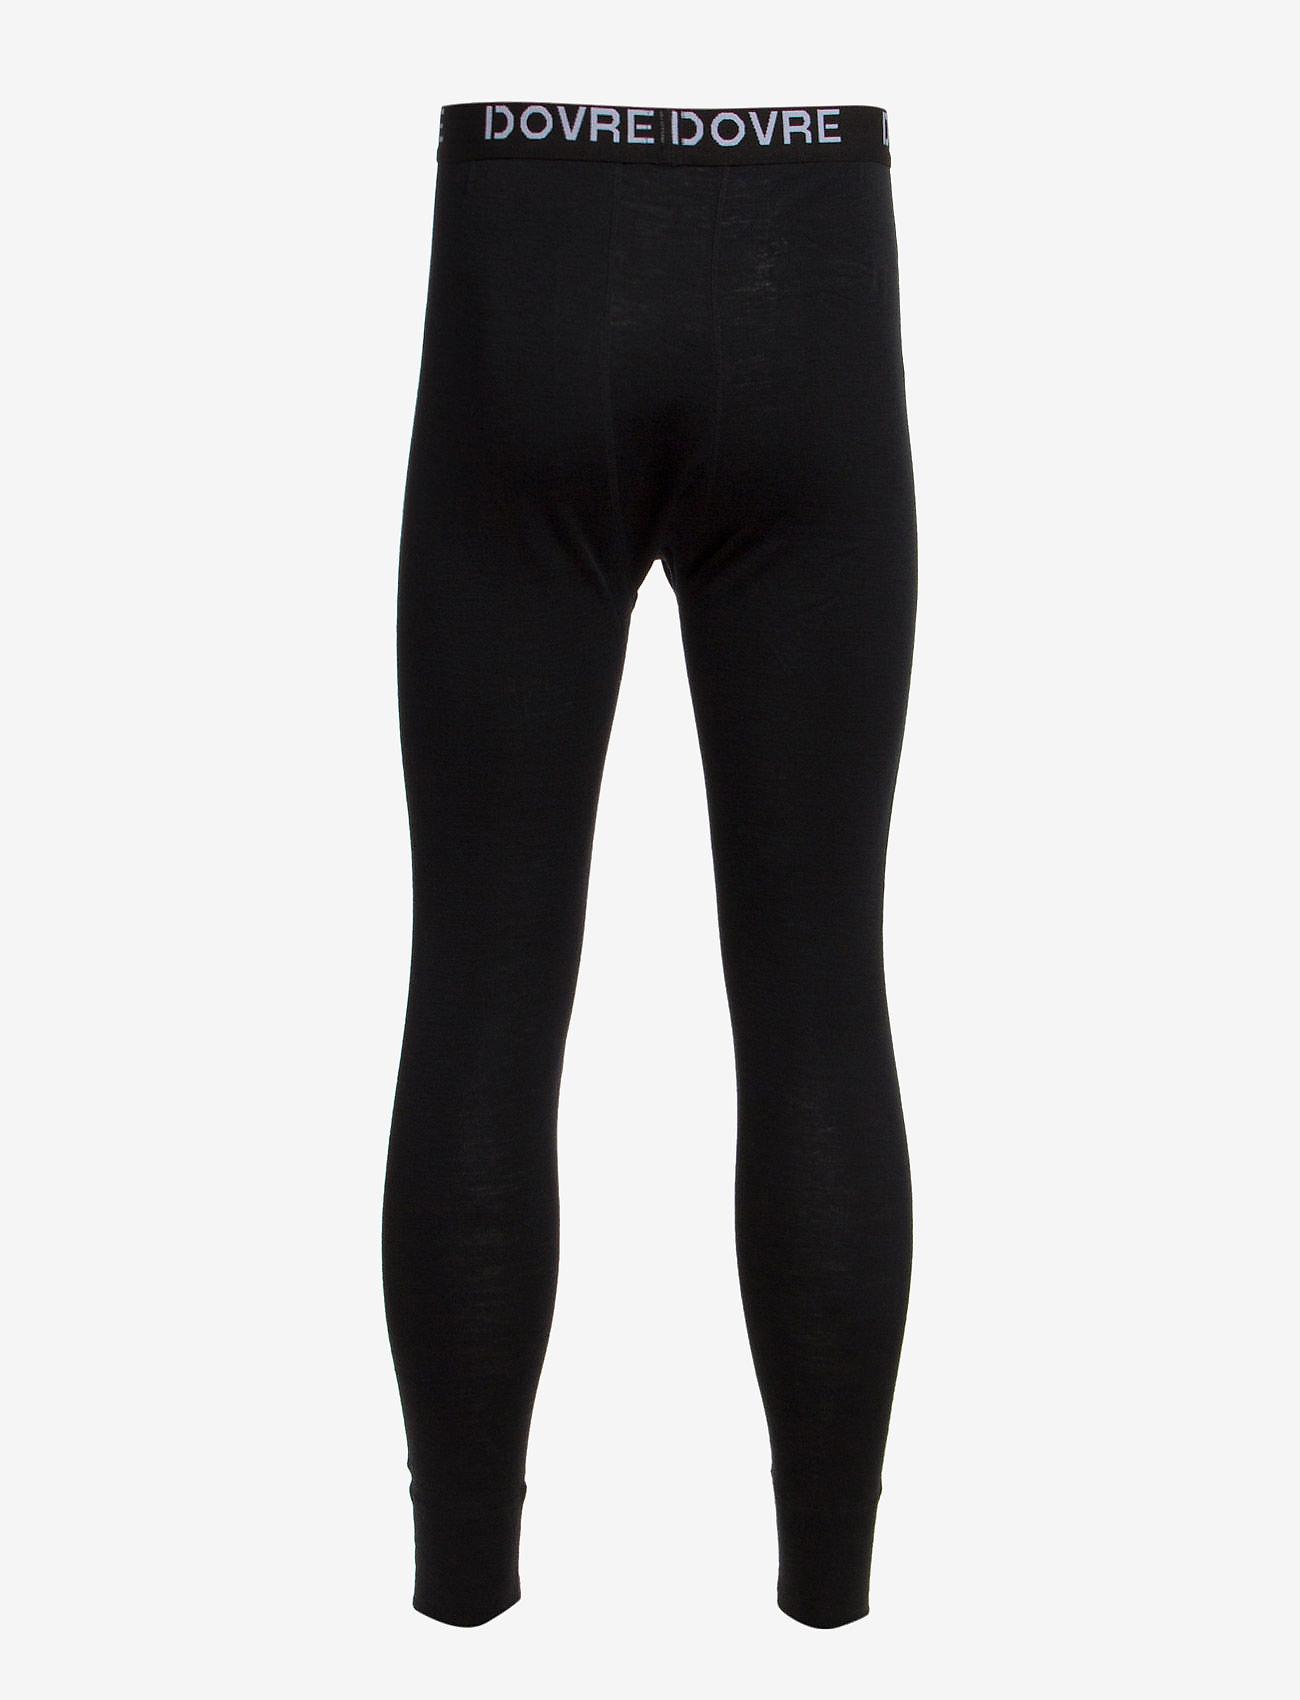 Dovre - Dovre Wool Long Johns - base layer bottoms - sort - 1